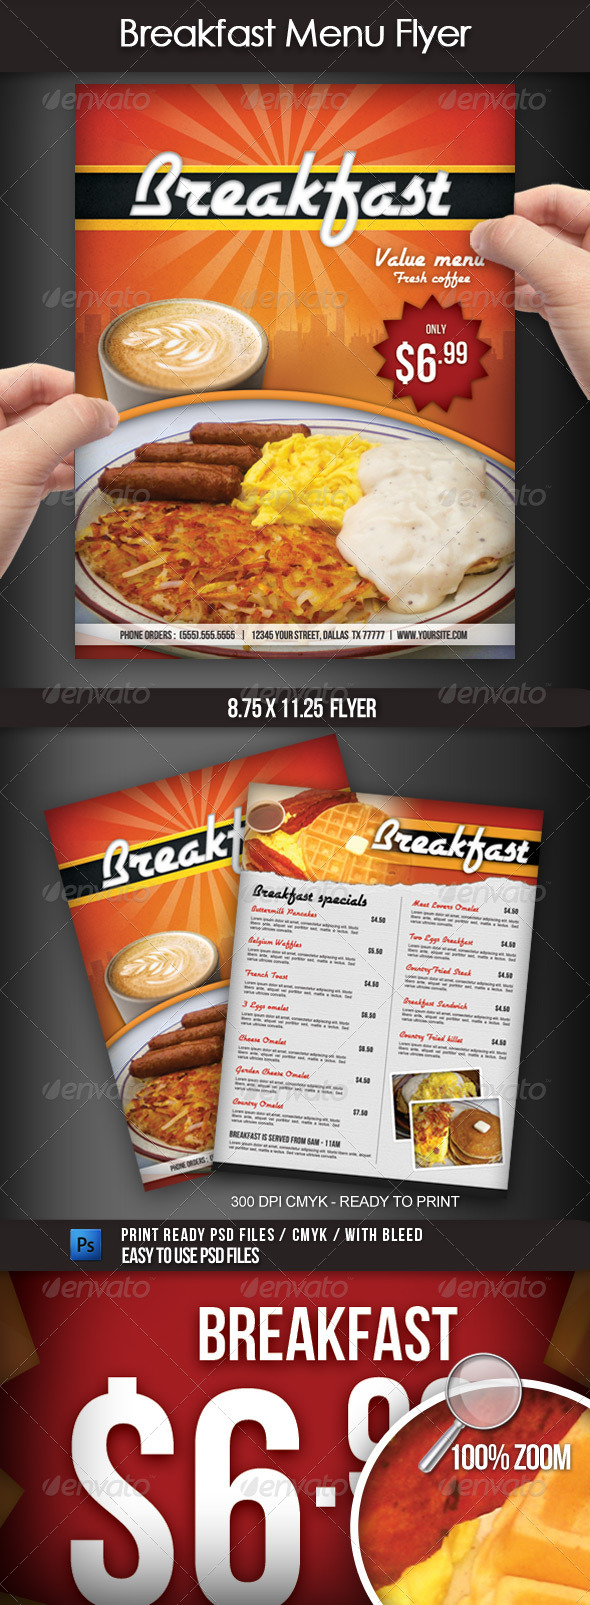 GraphicRiver Breakfast Menu Flyer 2583863